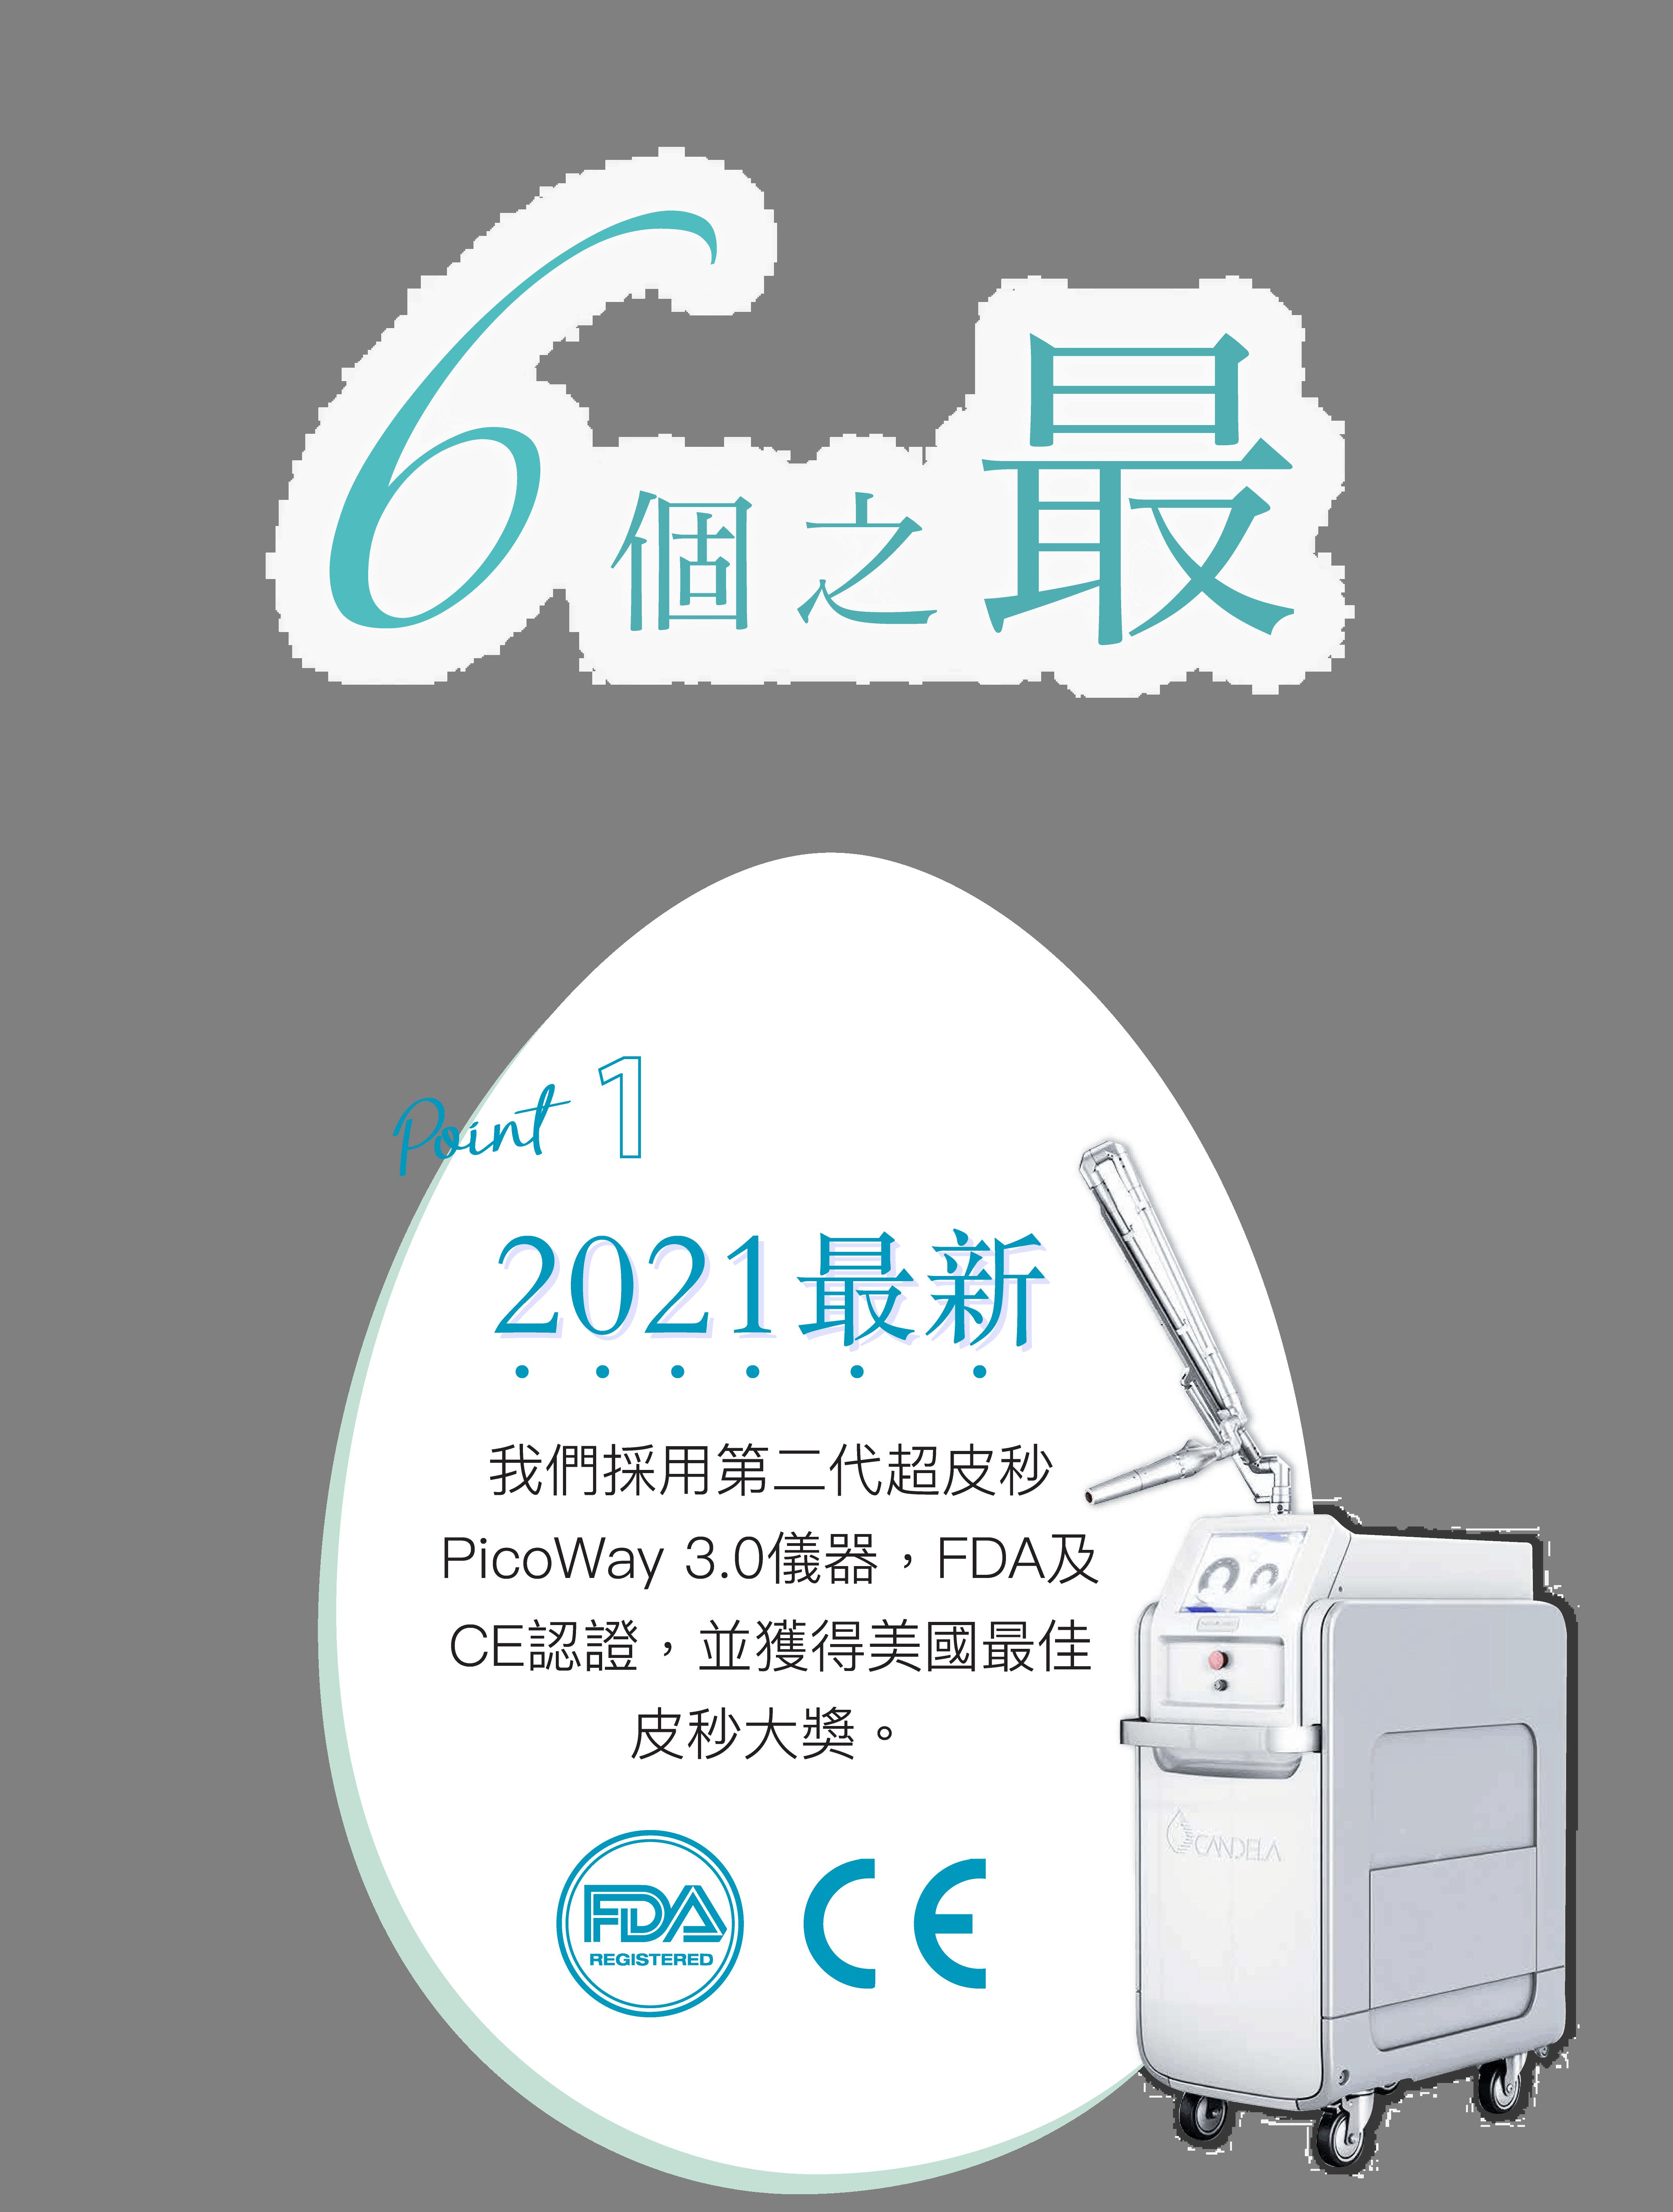 picoway_n02 Pico banner update egg 03 mobile 07 1